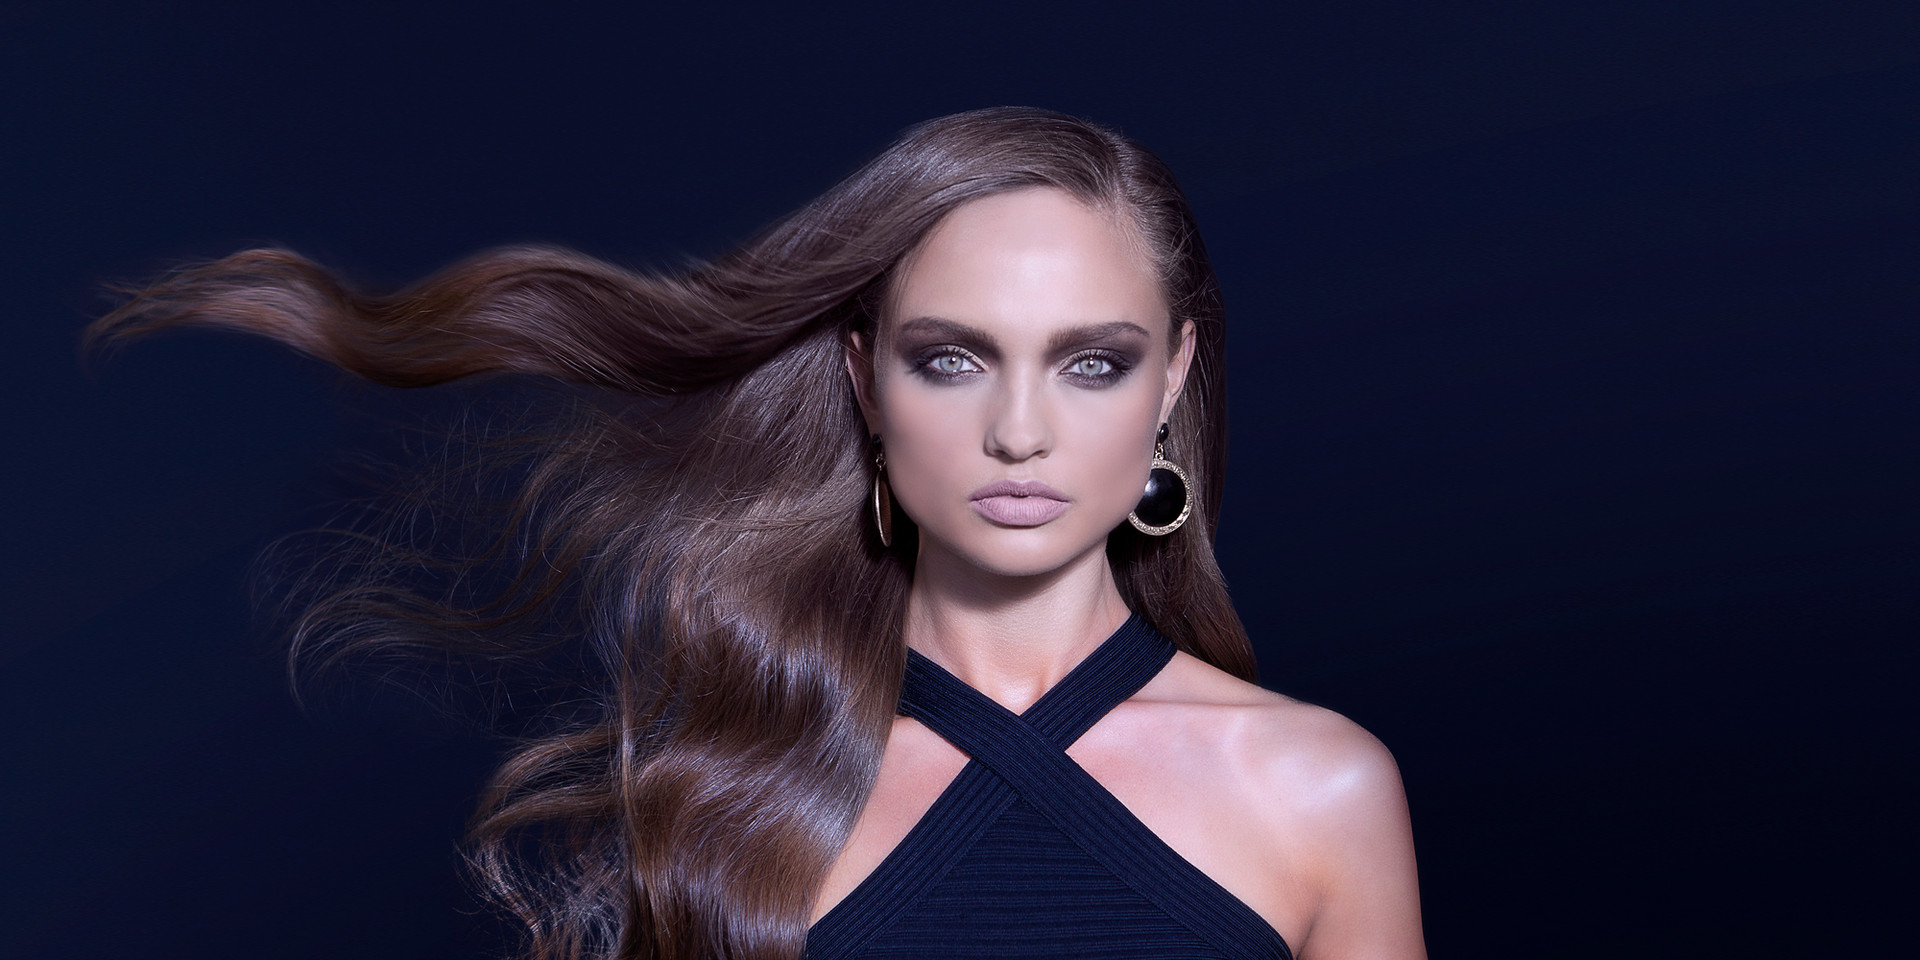 L'Oreal Hair inspiration